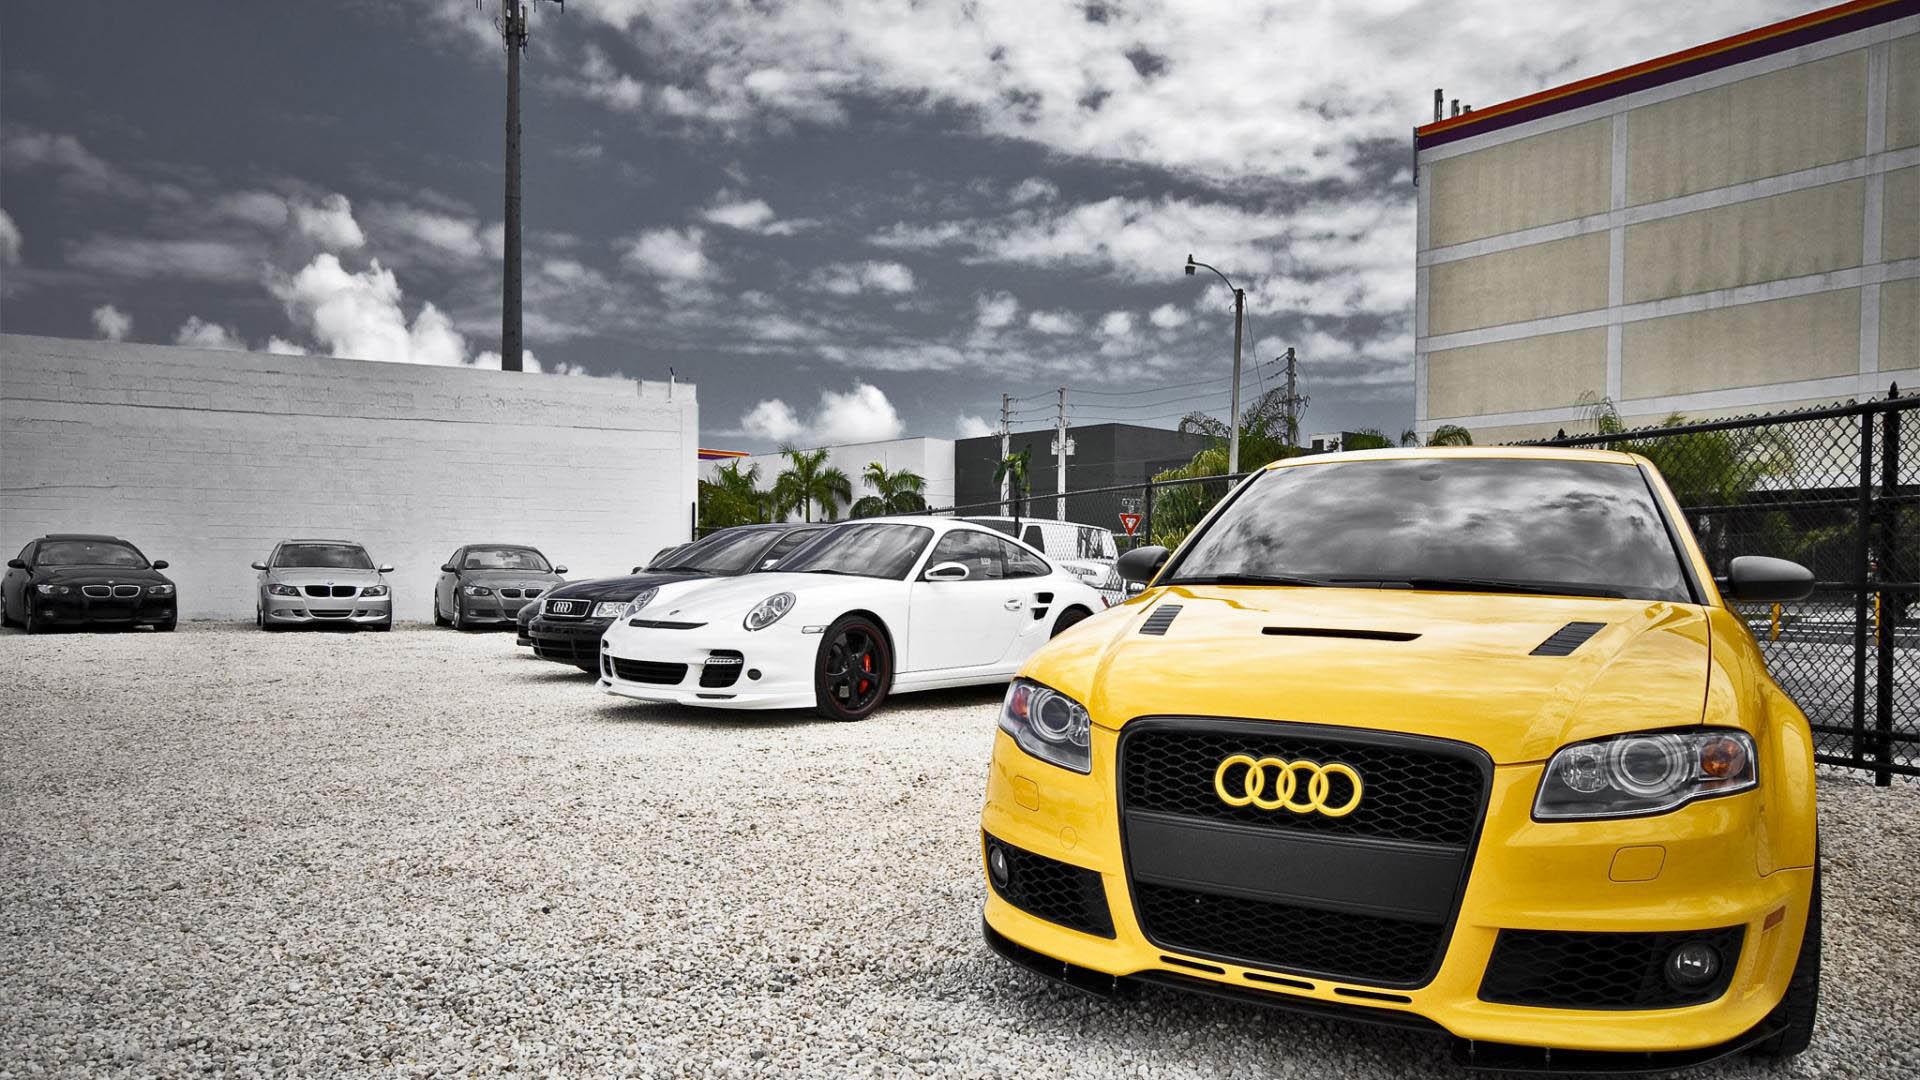 Full Hd Car Wallpapers 1080p 65 Images